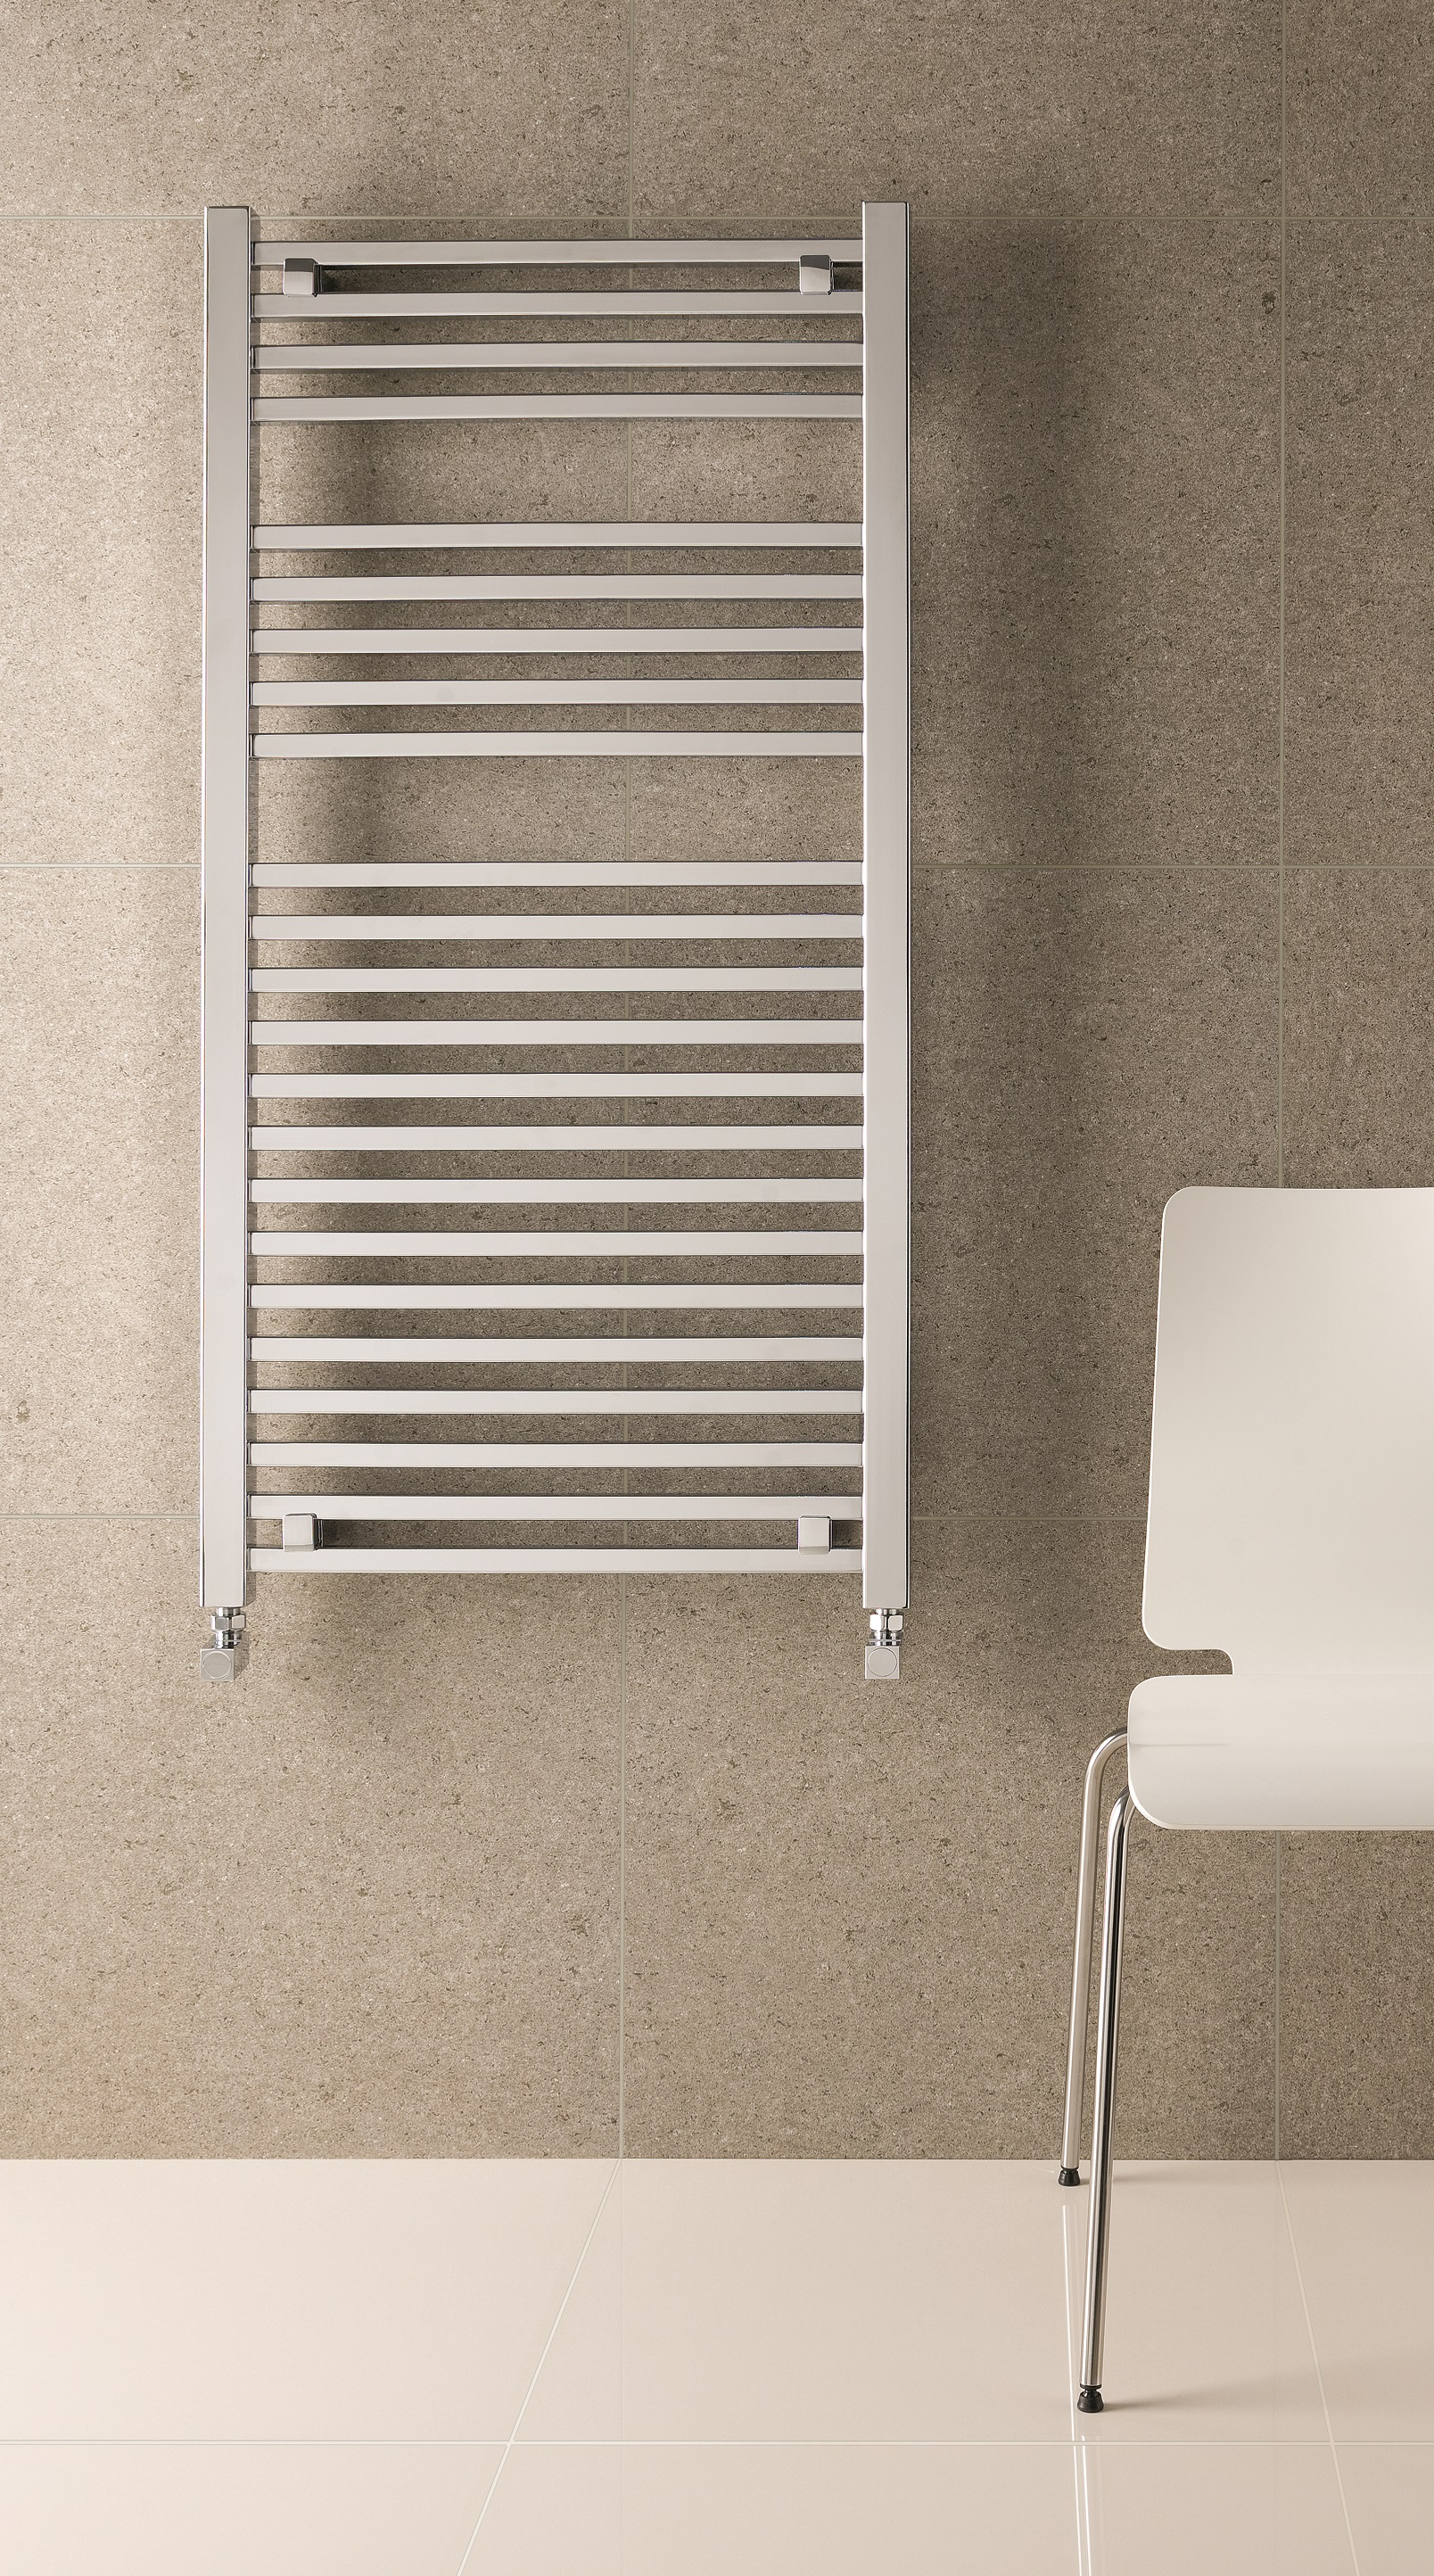 Eastbrook Biava Square handdoek radiator 120x50cm Chroom 612 watt